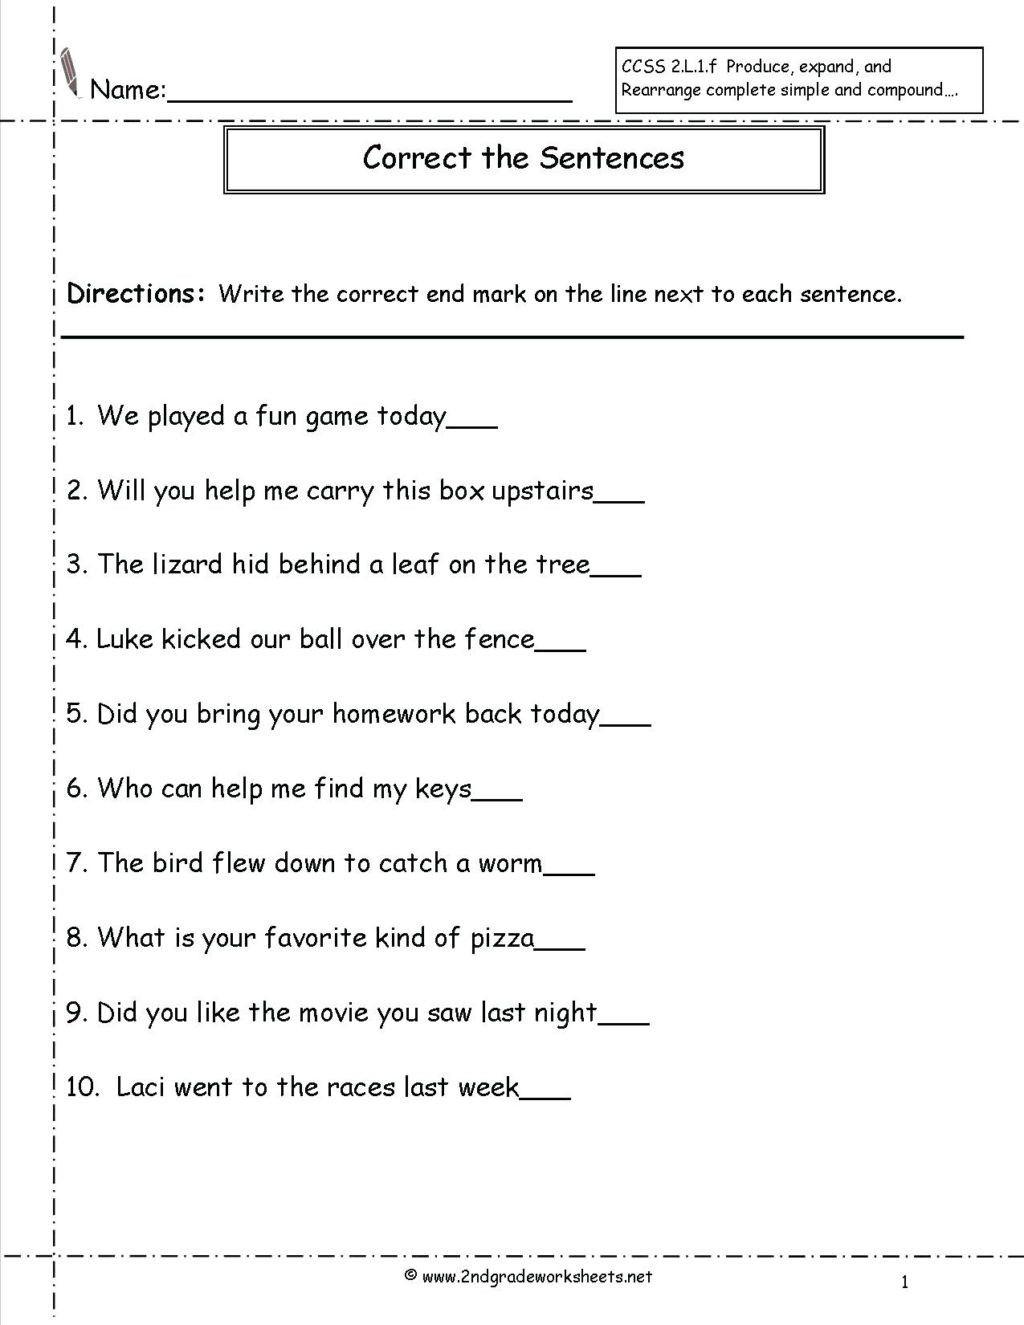 30 Factoring Worksheet Algebra 1